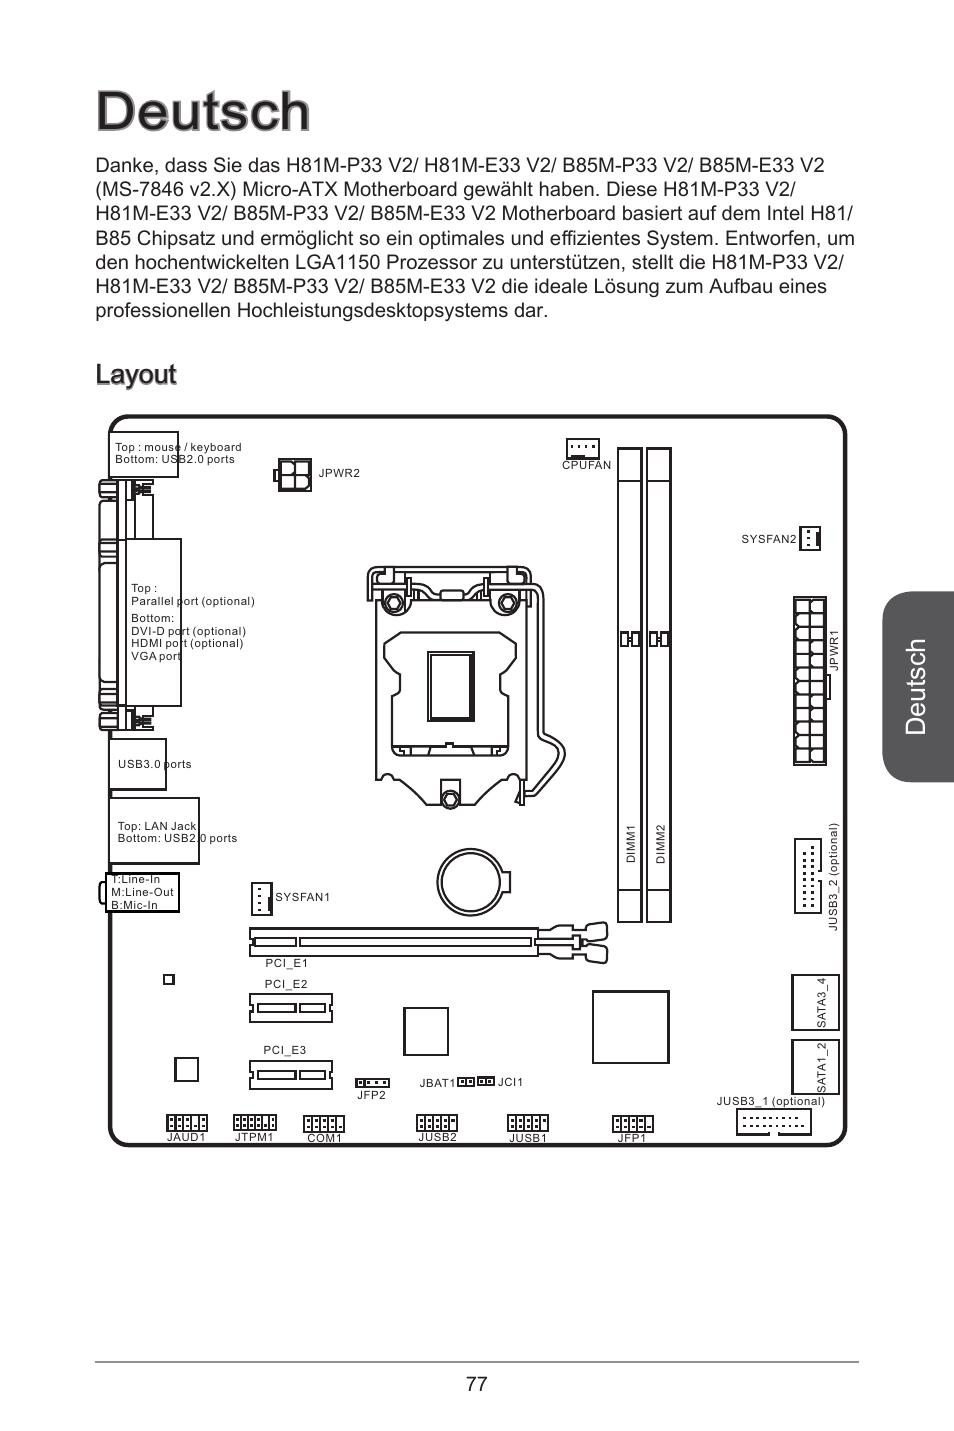 msi h81m e33 v2 page77 deutsch, layout msi h81m e33 v2 user manual page 77 182  at alyssarenee.co